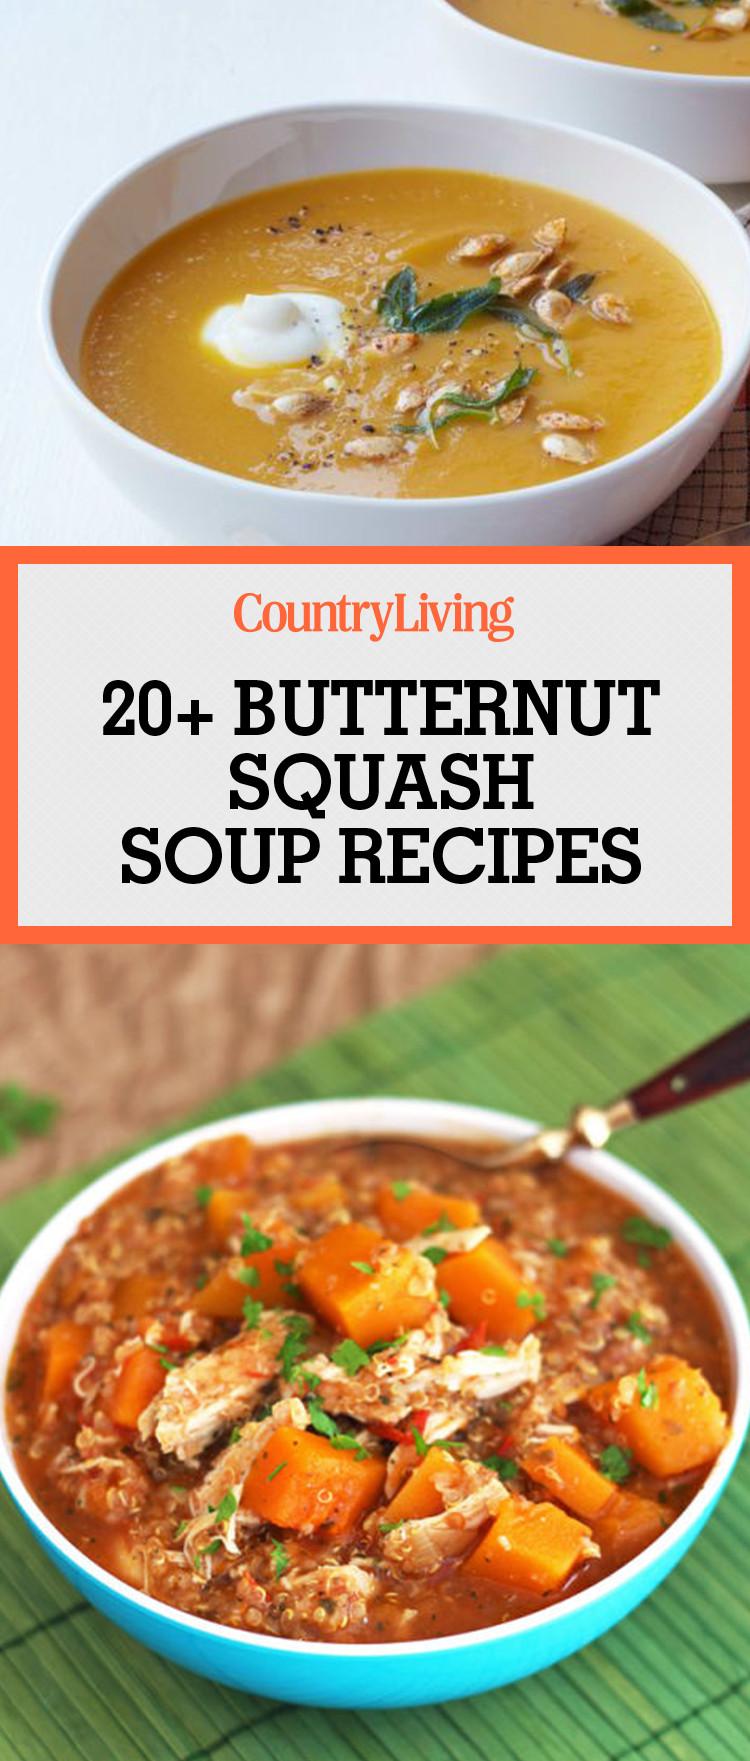 Best Butternut Squash Soup  24 Best Butternut Squash Soup Recipes How to Make